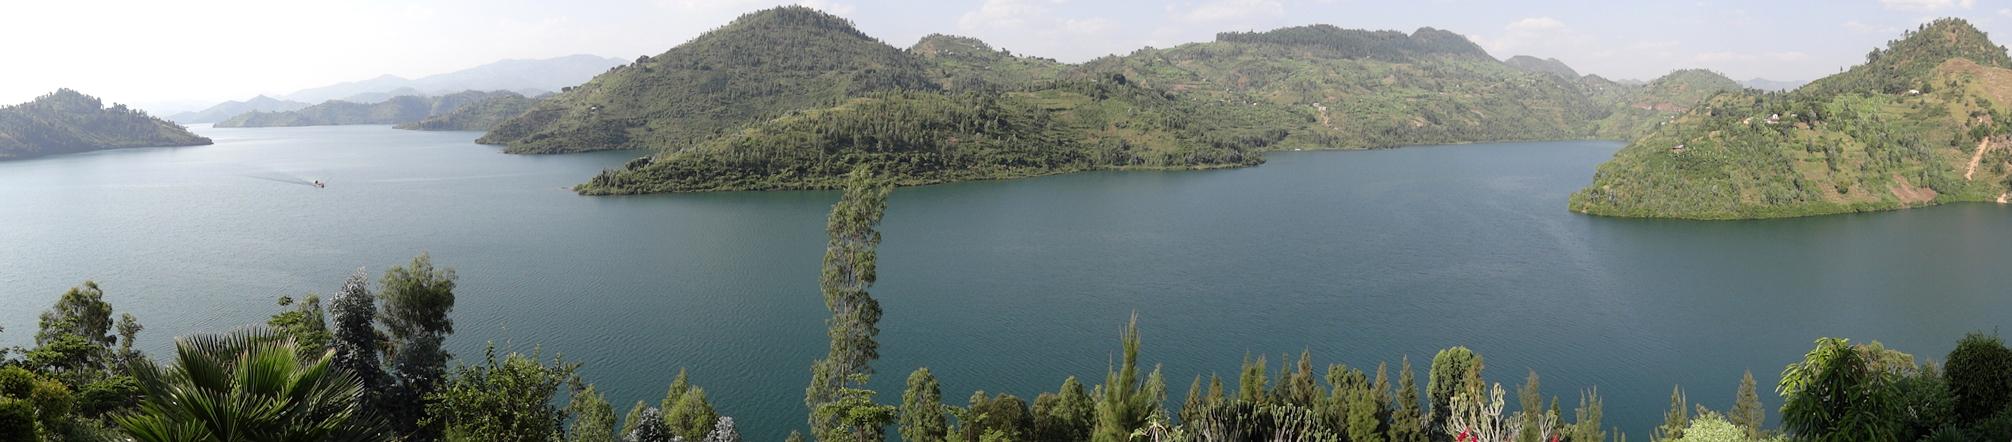 Kivu Lake 1